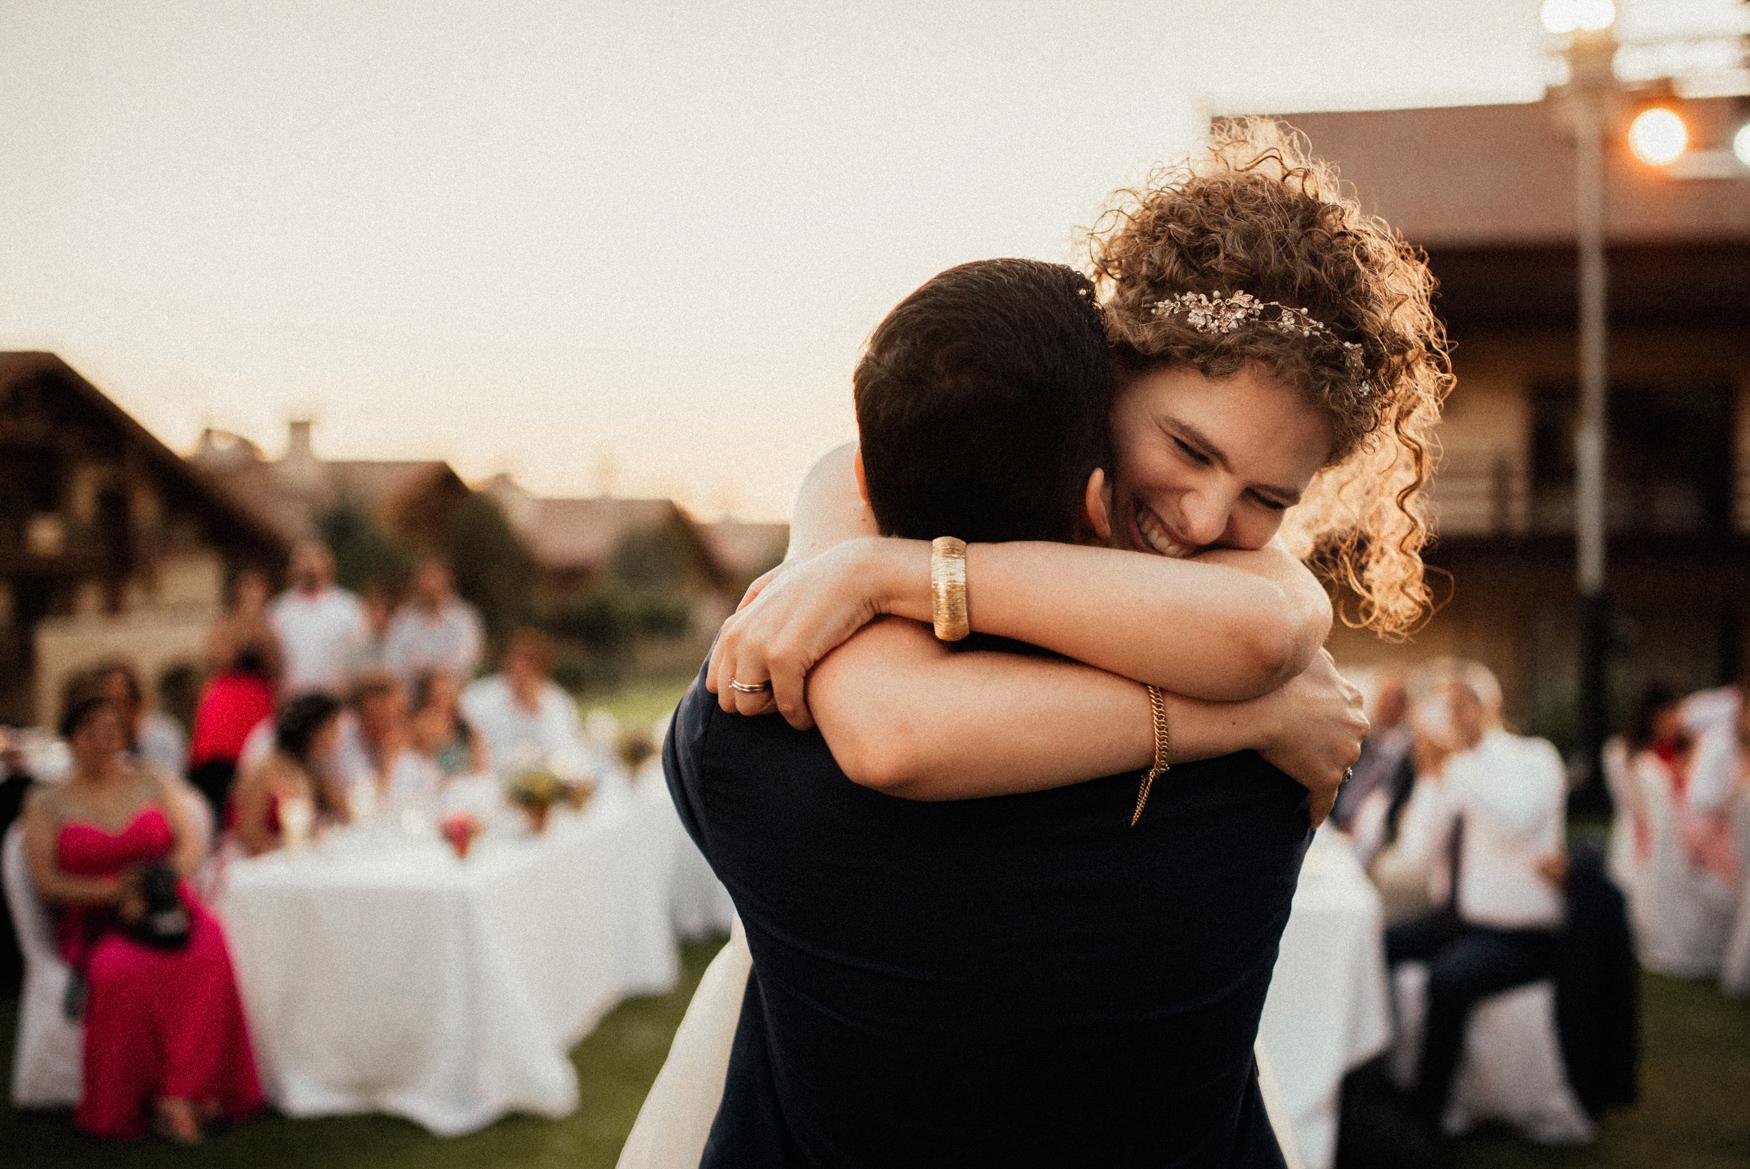 LR5 beirut lebanon mzaar intercontinental wedding photographer 017.jpg